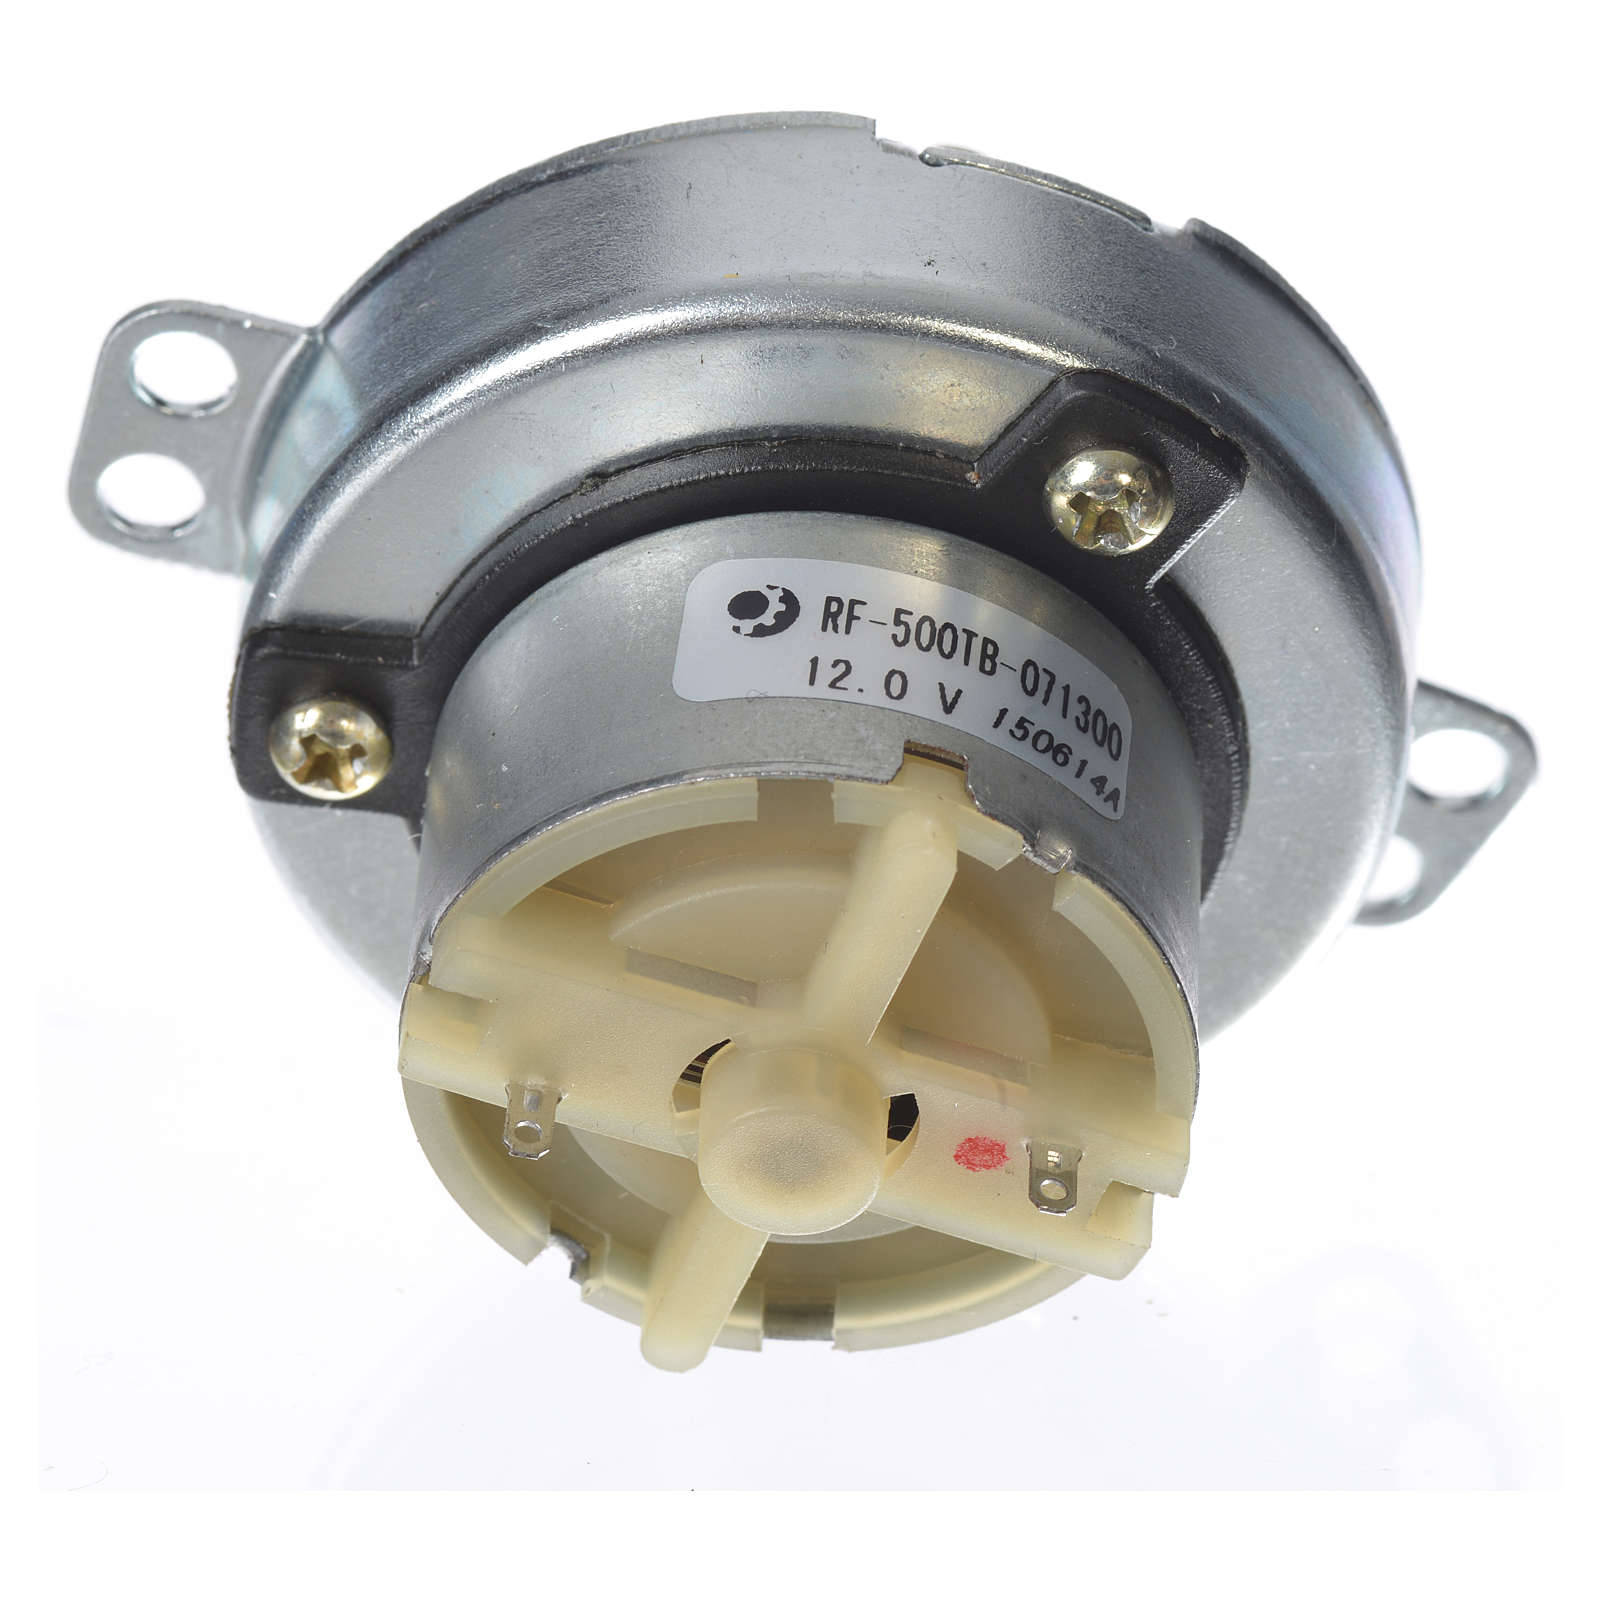 Motoriduttore MECC presepe 10 giri/min 4